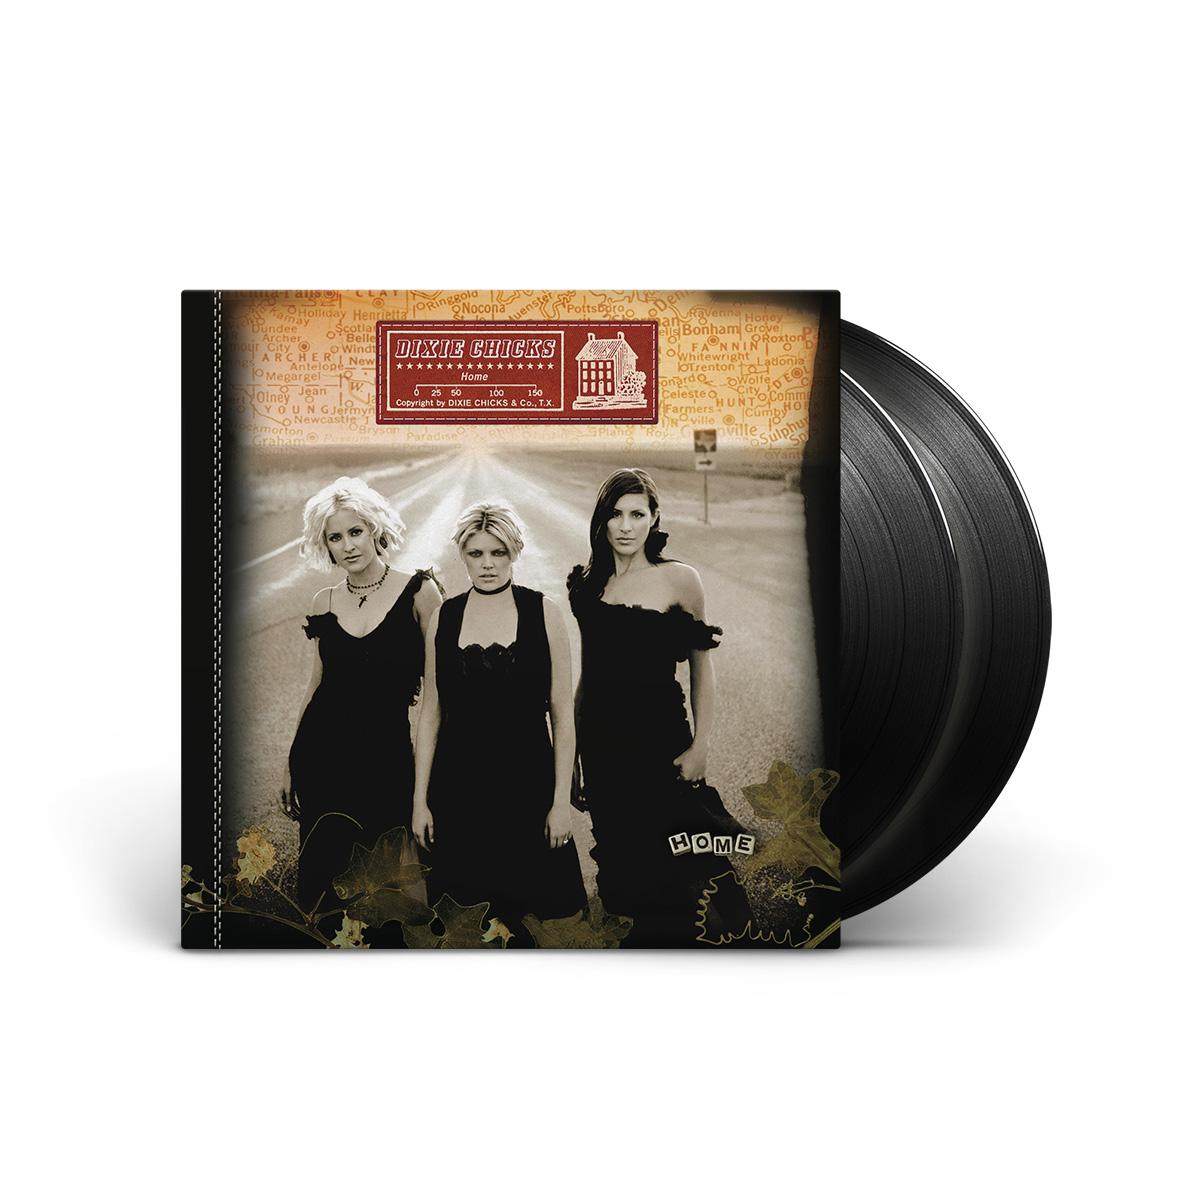 Dixie Chicks: Home LP